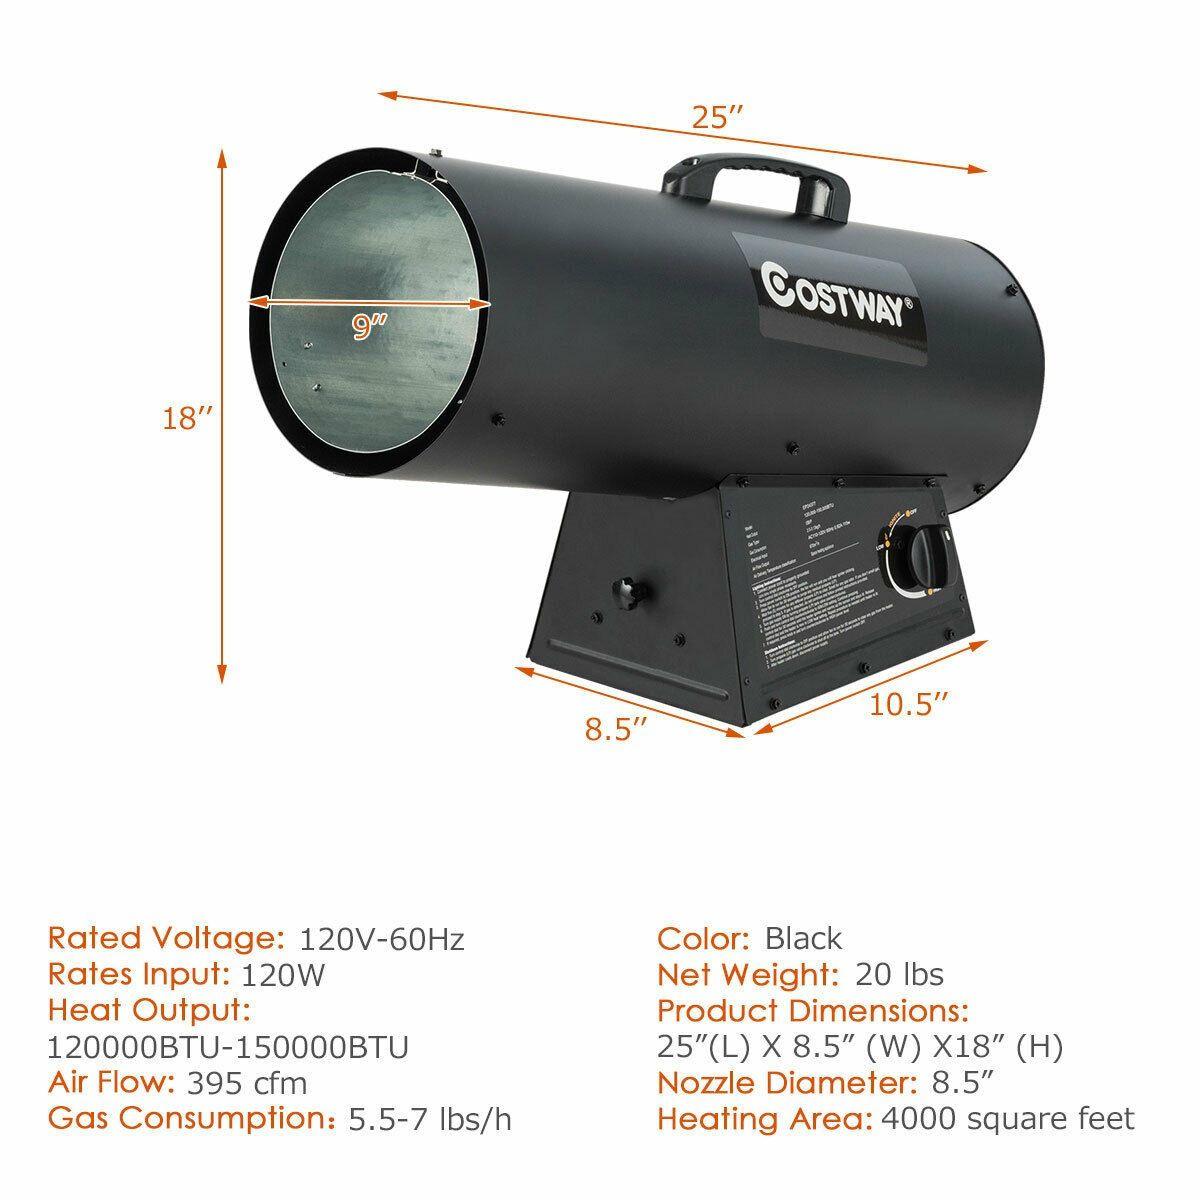 150000BTU Portable Air Propane Heater with Adjustable